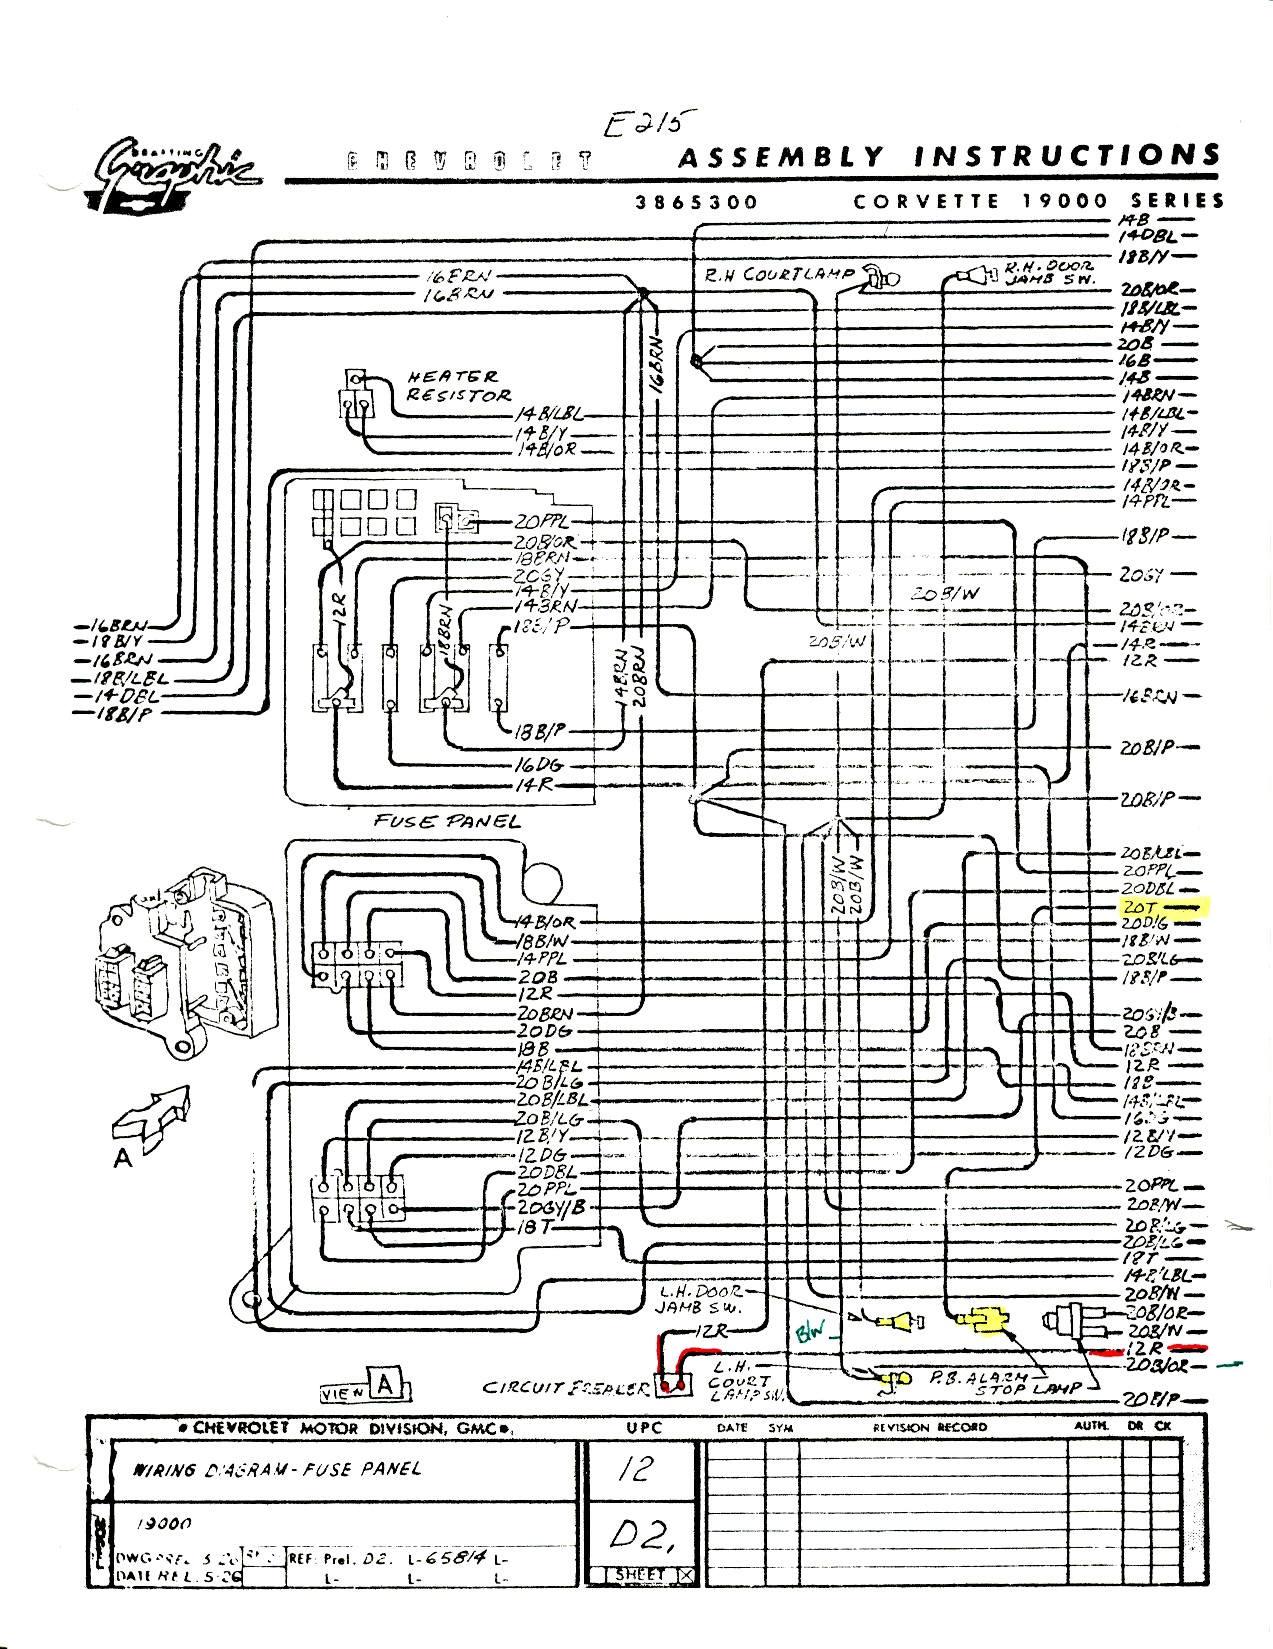 2008 corvette engine diagram wiring library detailed2000 c5 corvette engine diagram index listing of wiring diagrams 1989 corvette ecm wiring diagram 2008 corvette engine diagram